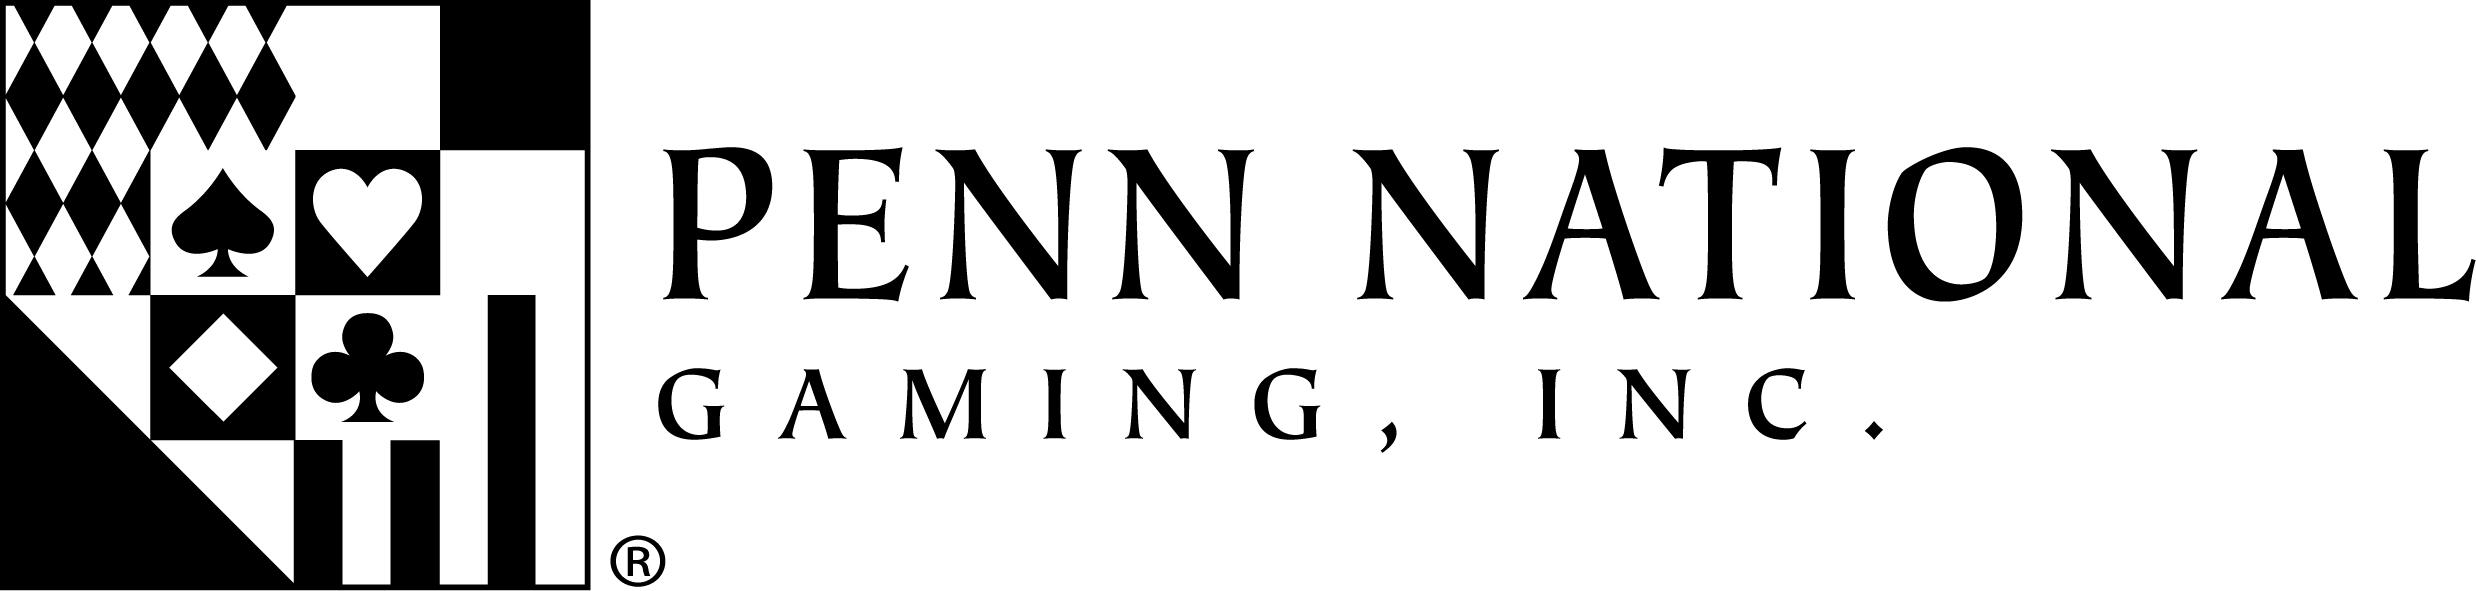 Penn National Gaming St. Louis | Argosy, Hollywood & River City Casinos logo